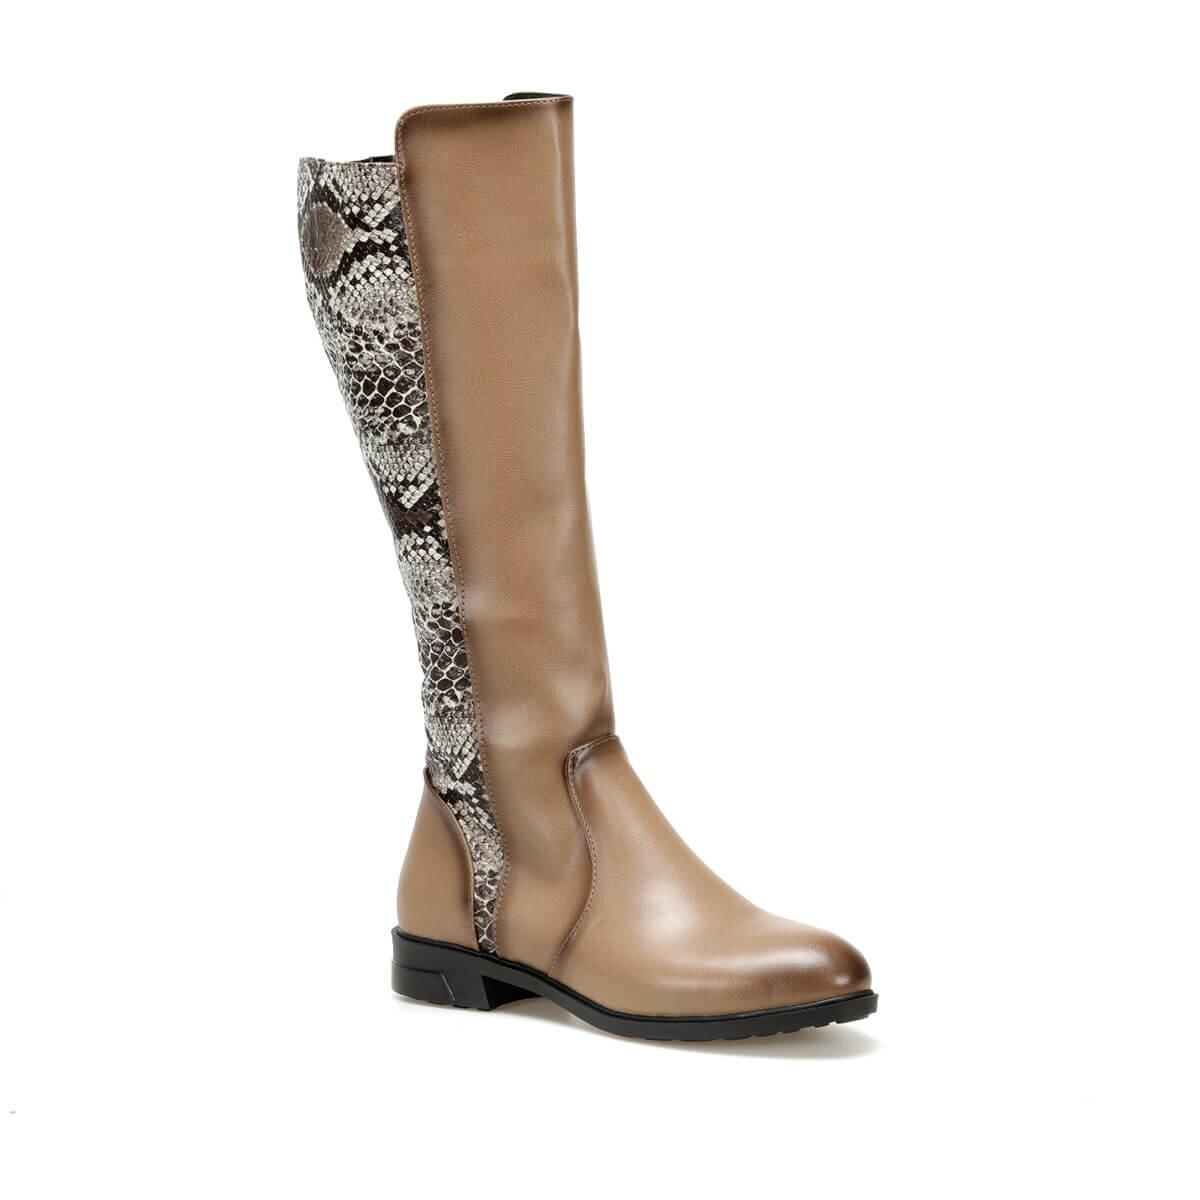 حذاء بوت نسائي من فلو جوارديولa11z